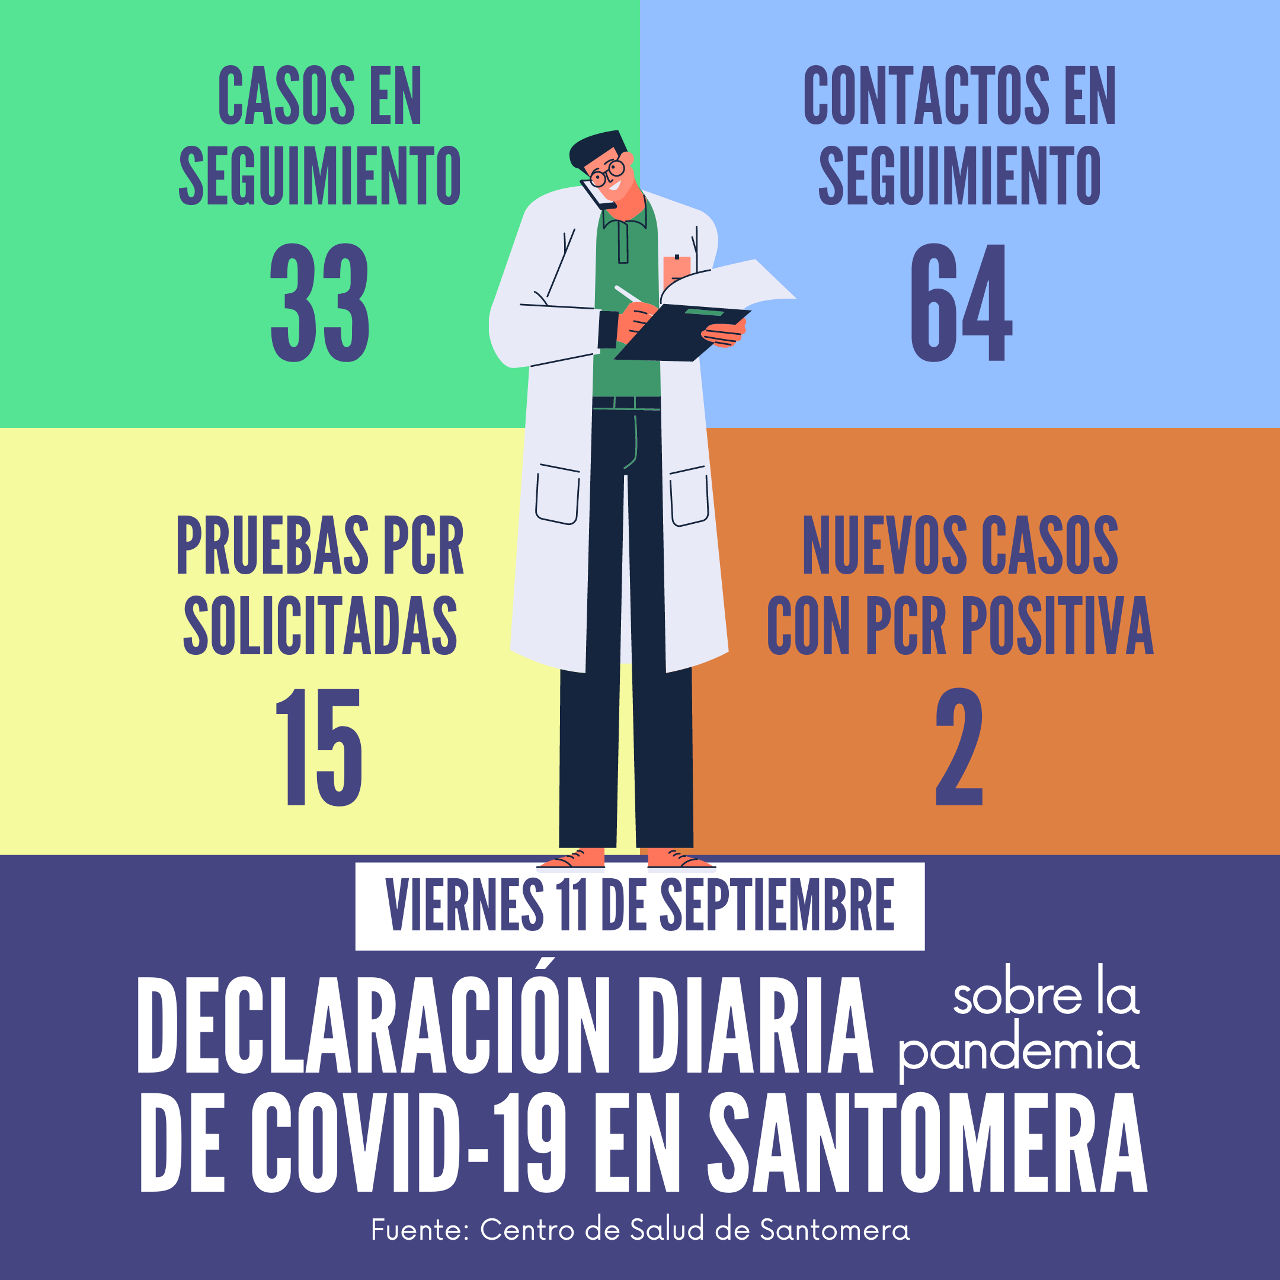 20200911_Datos COVID-19 Santomera